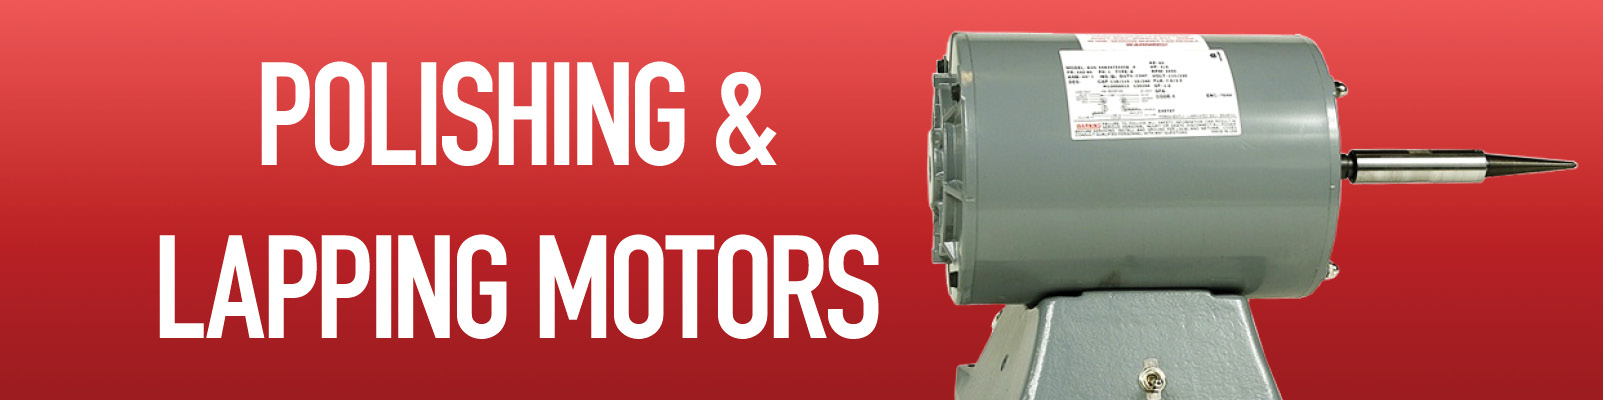 Polishing & Lapping Motors